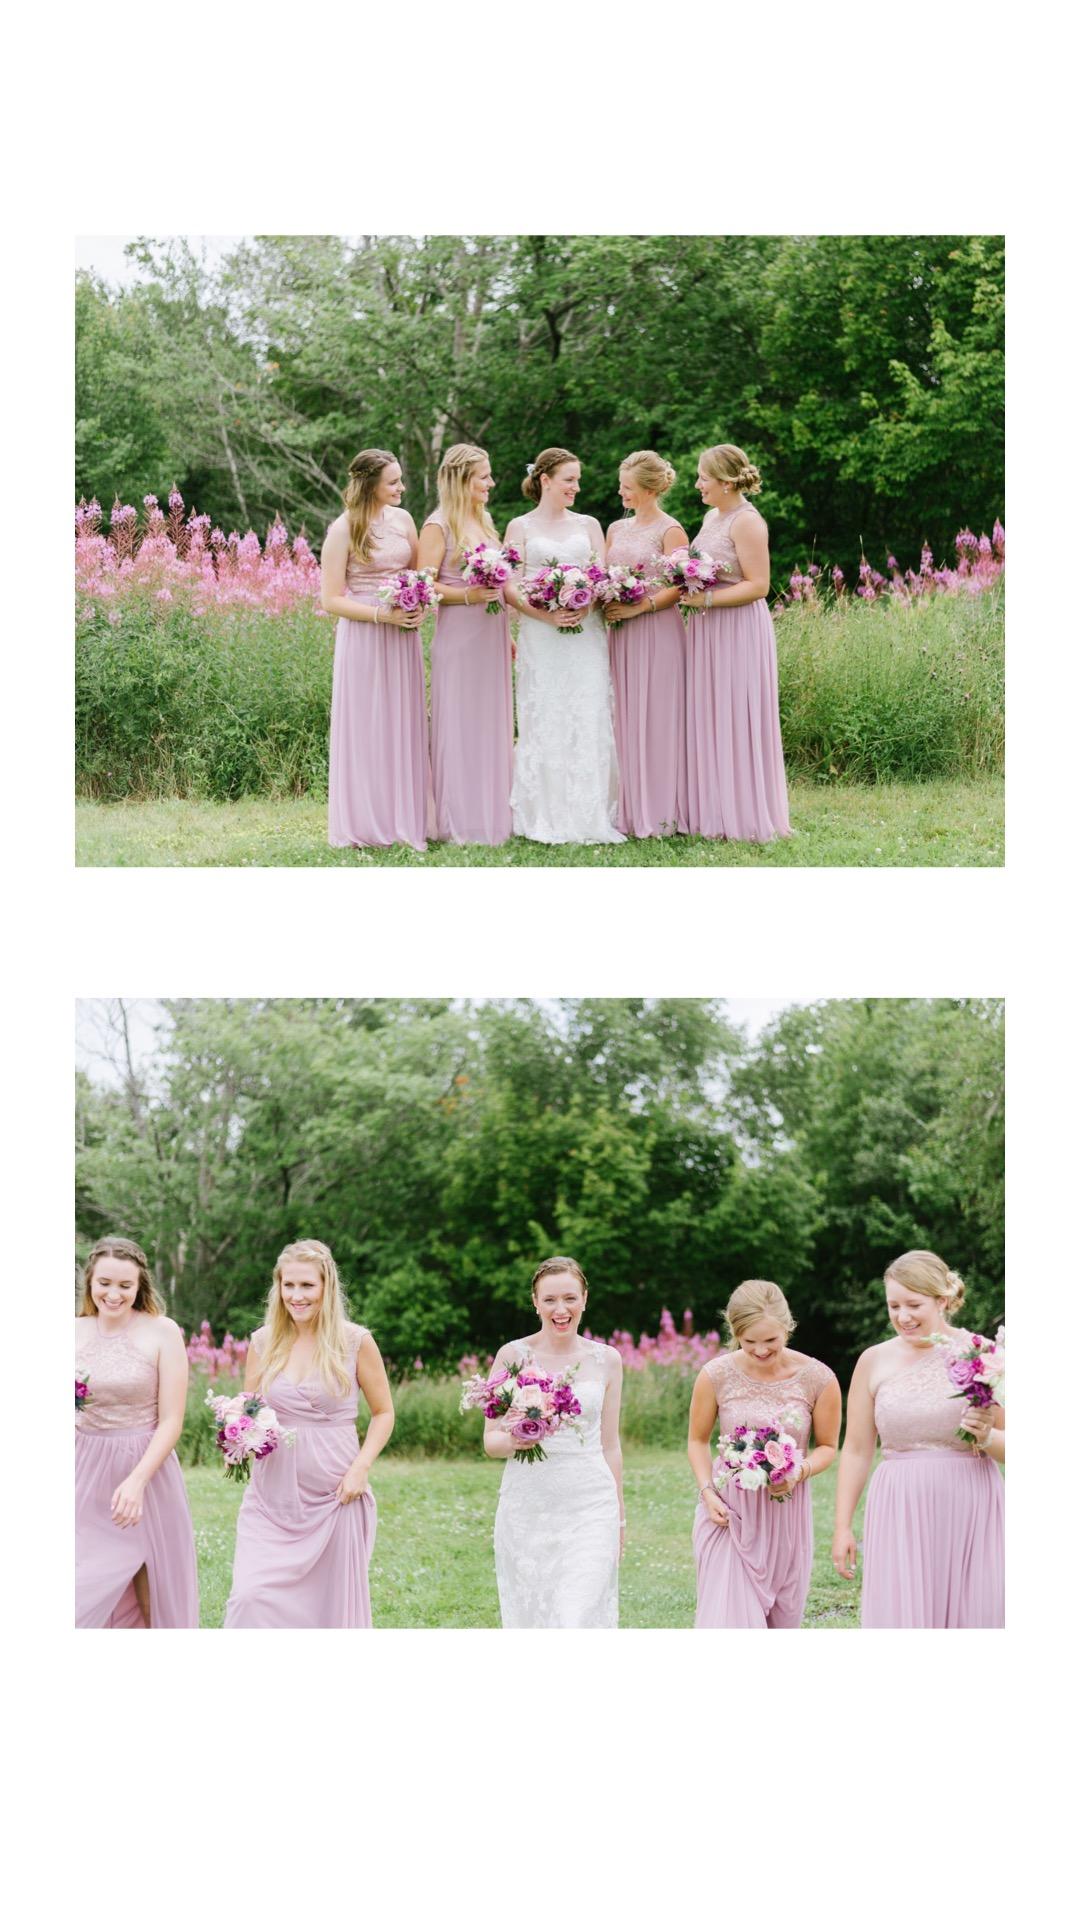 Martina & Scott Halifax Wedding Photographer - Sinead Dubeau Photography 05